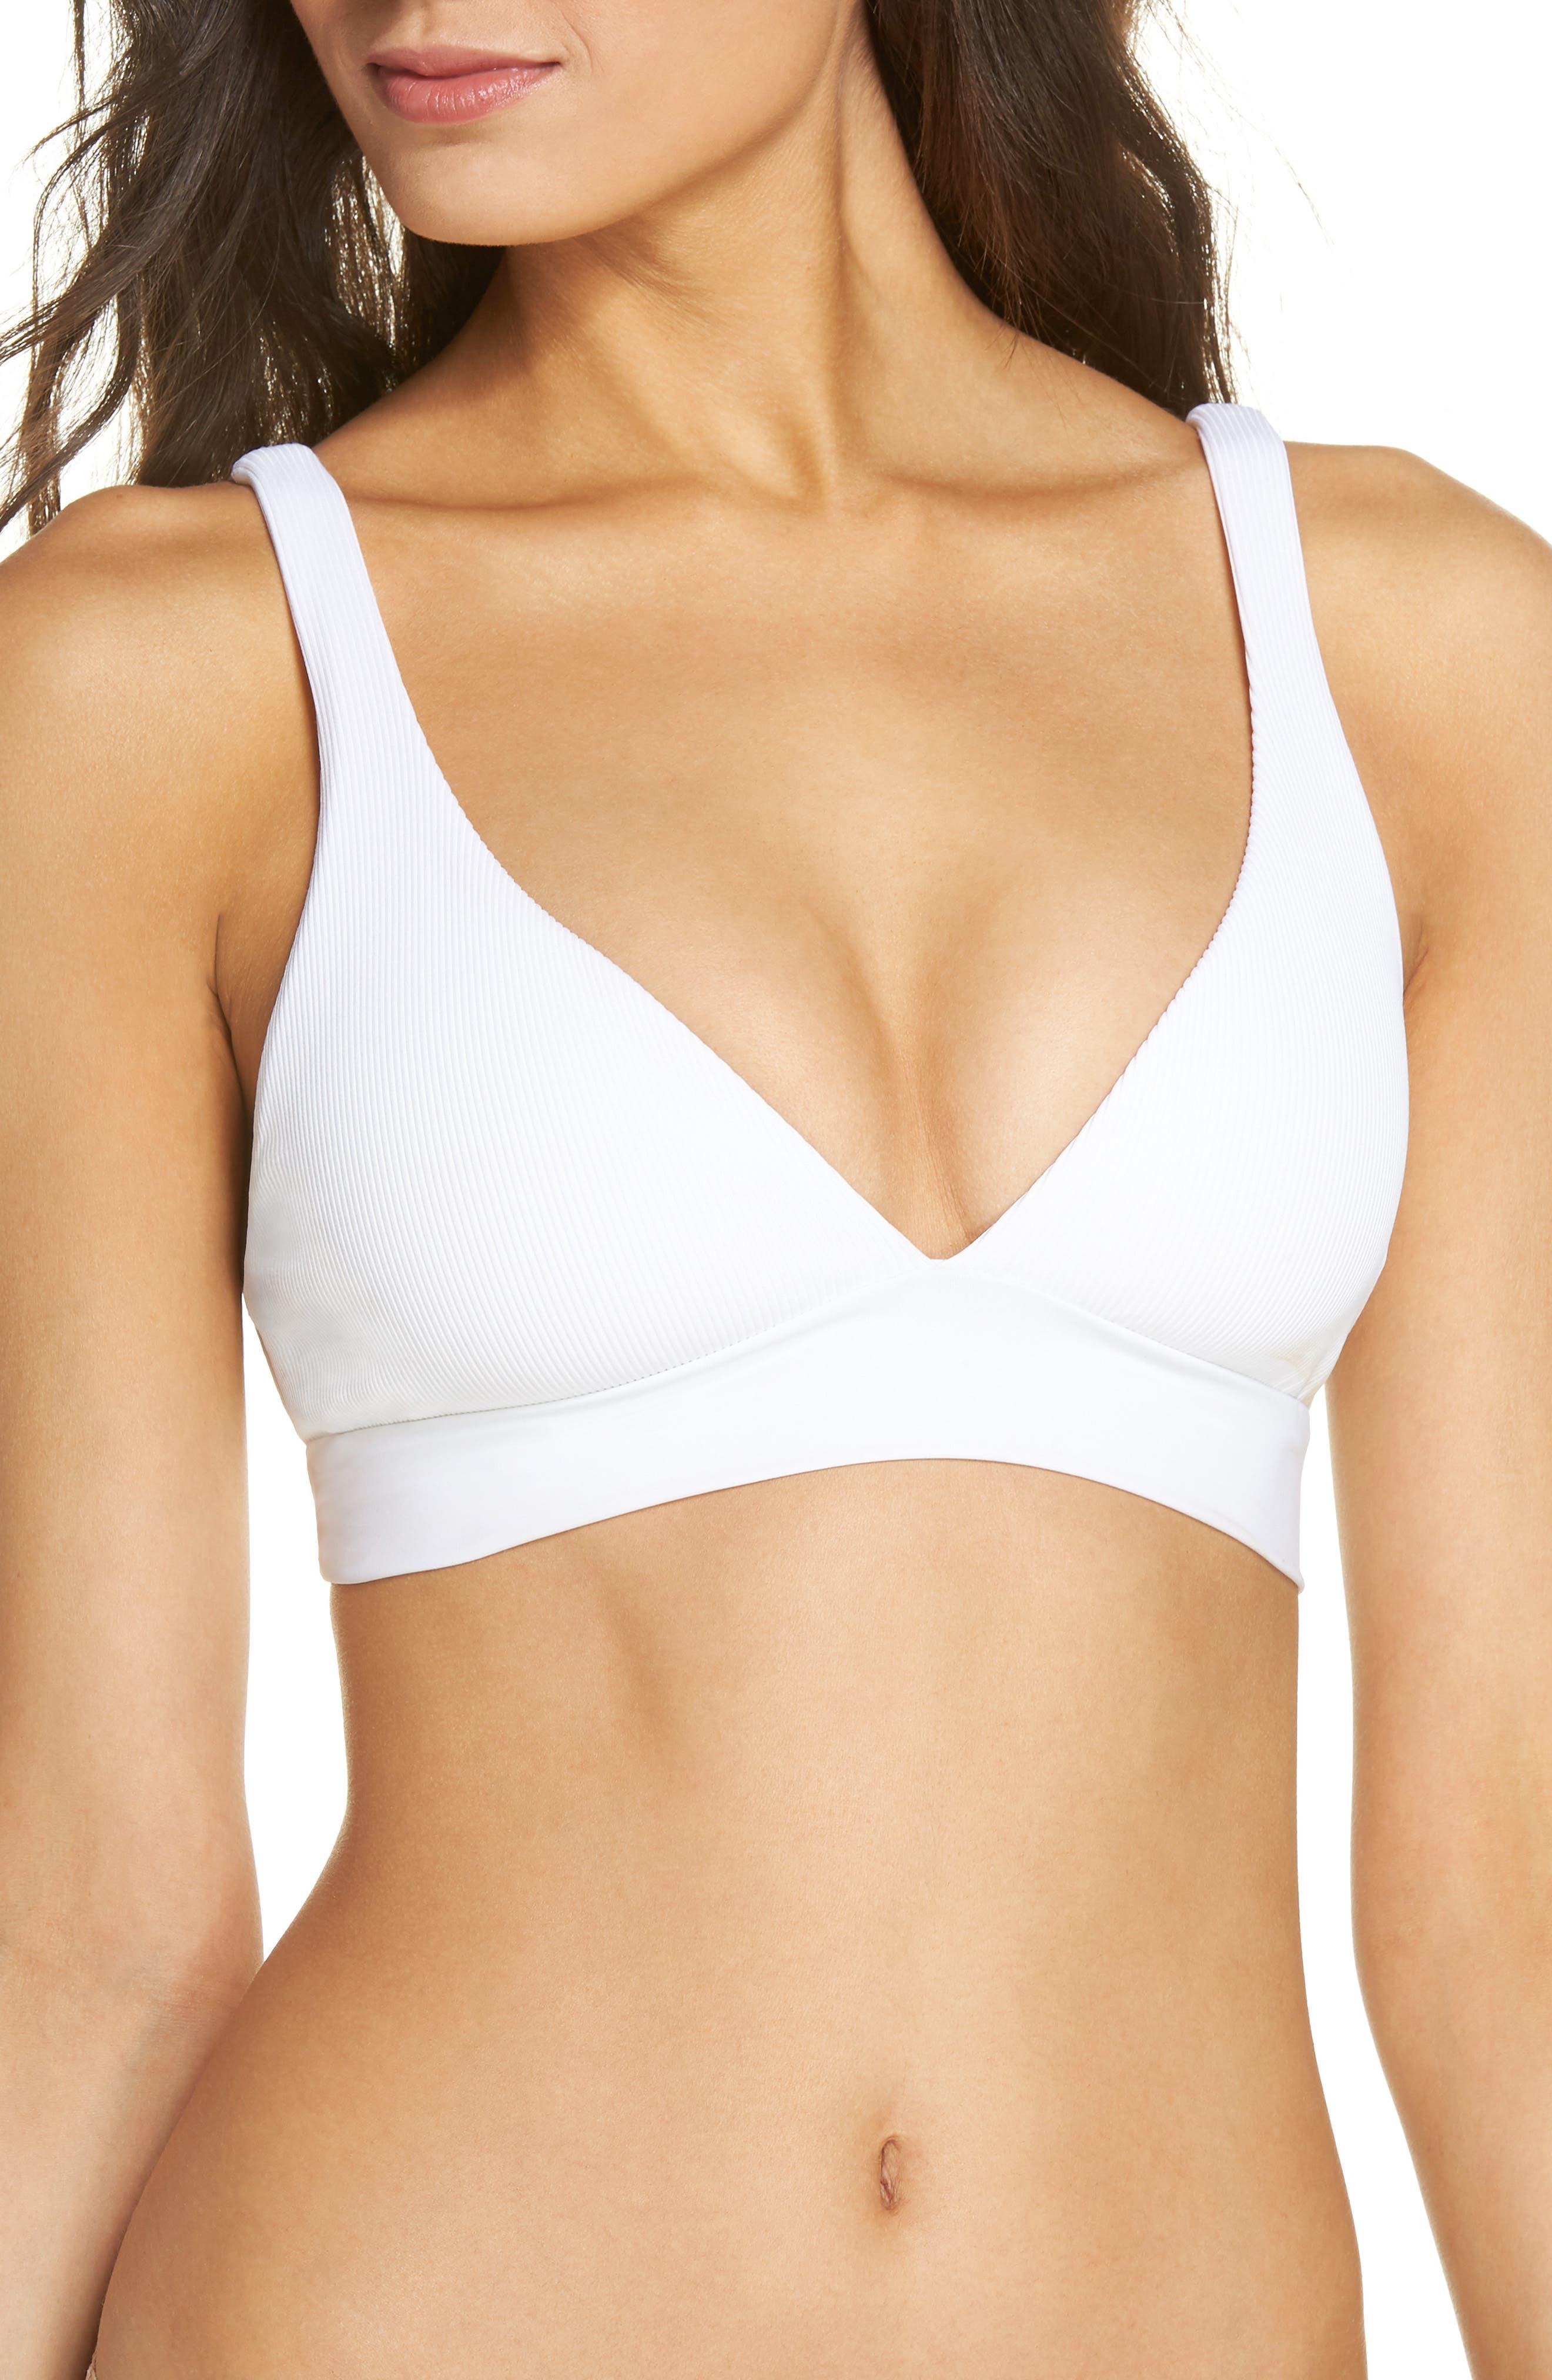 Phil Bikini Top,                         Main,                         color, White